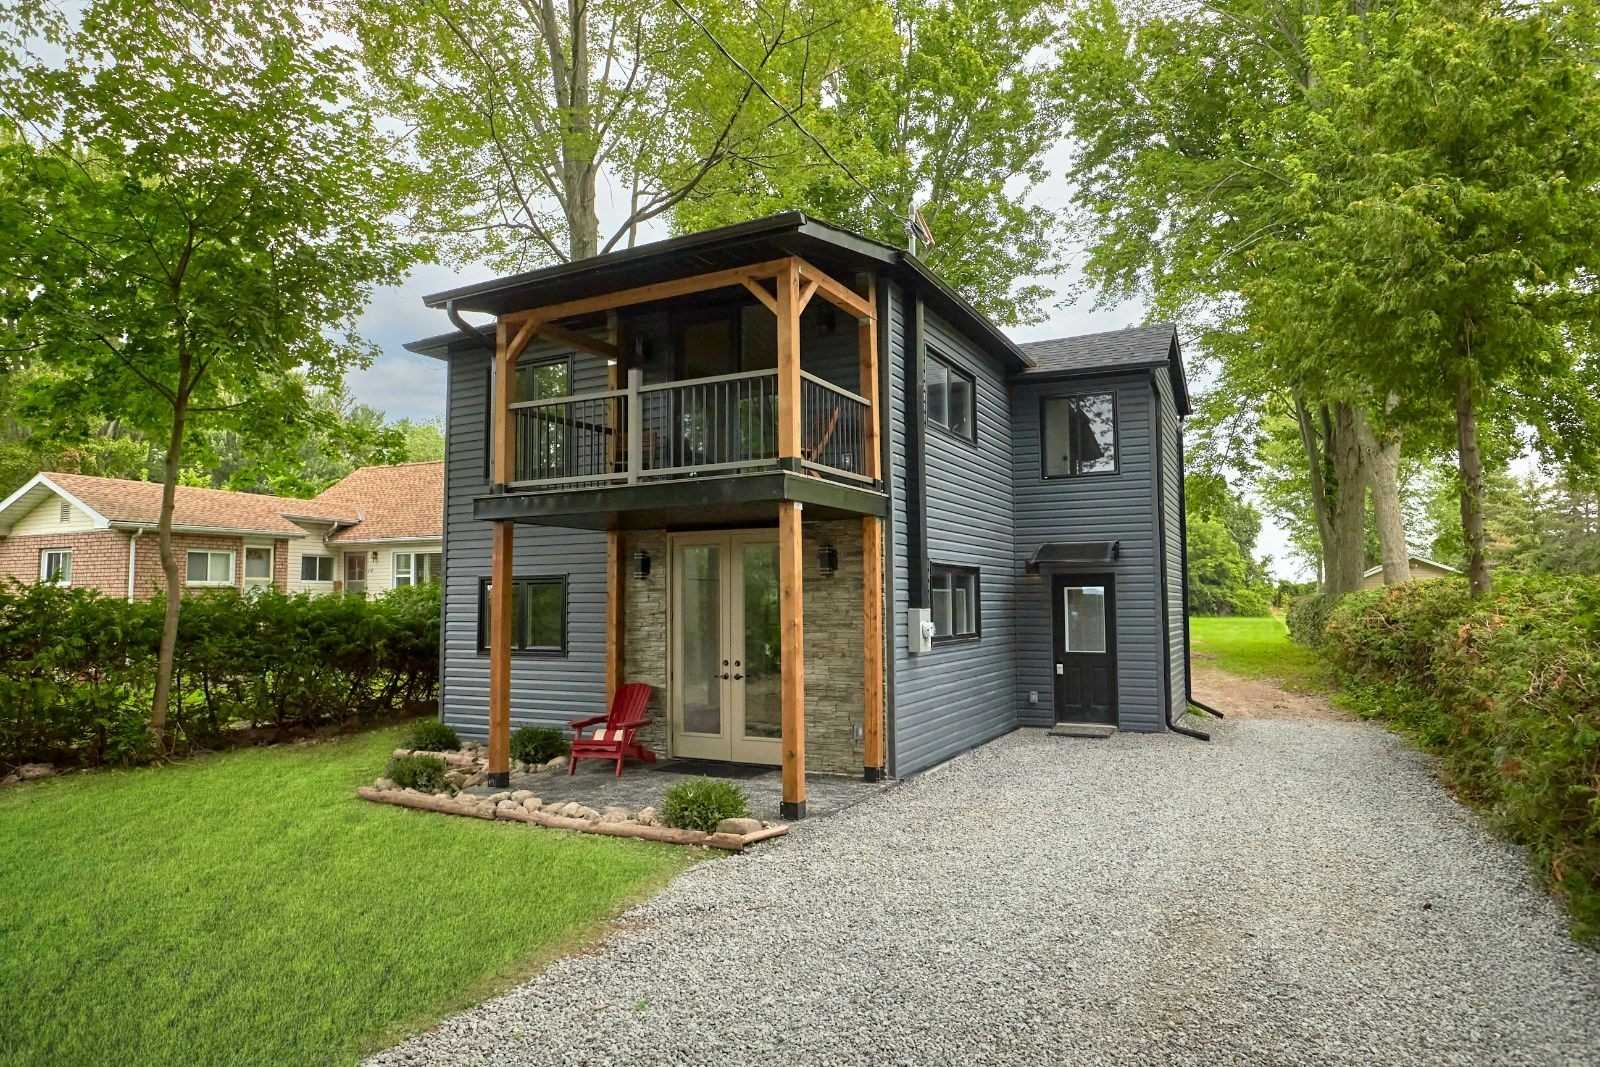 Detached house For Sale In Ramara - 2367 Lakeshore Dr, Ramara, Ontario, Canada L0K 1B0 , 3 Bedrooms Bedrooms, ,2 BathroomsBathrooms,Detached,For Sale,Lakeshore